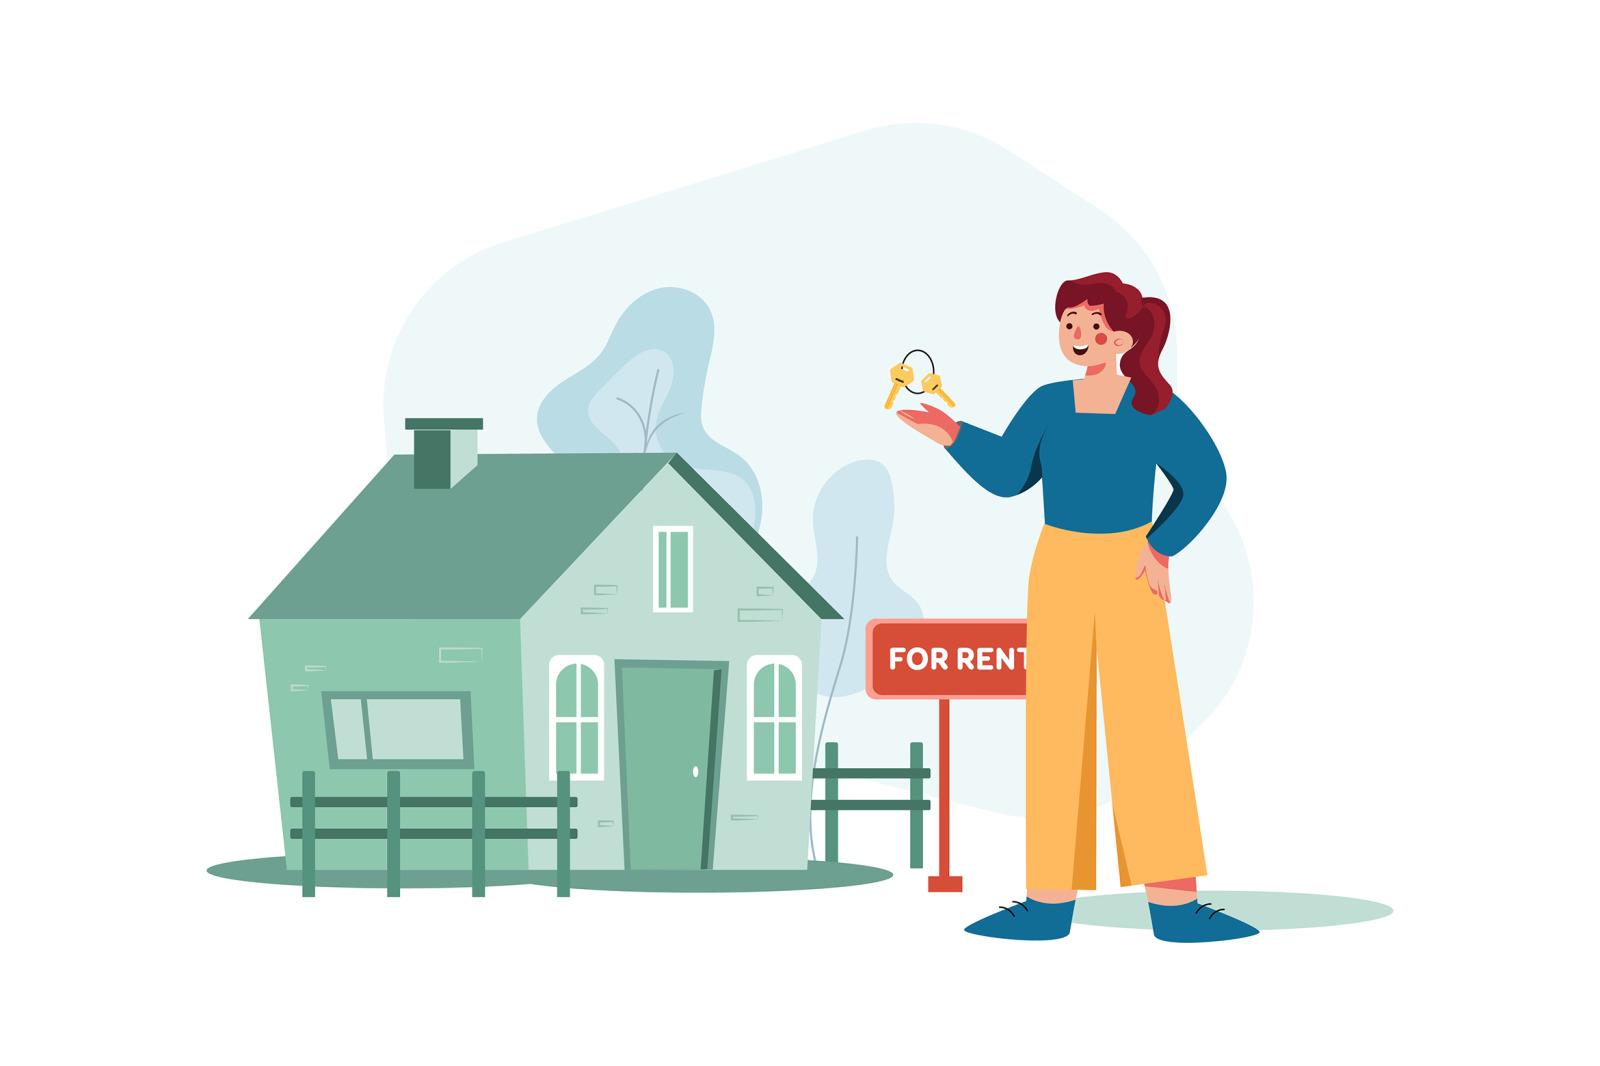 M344_Real Estate Property Illustrations